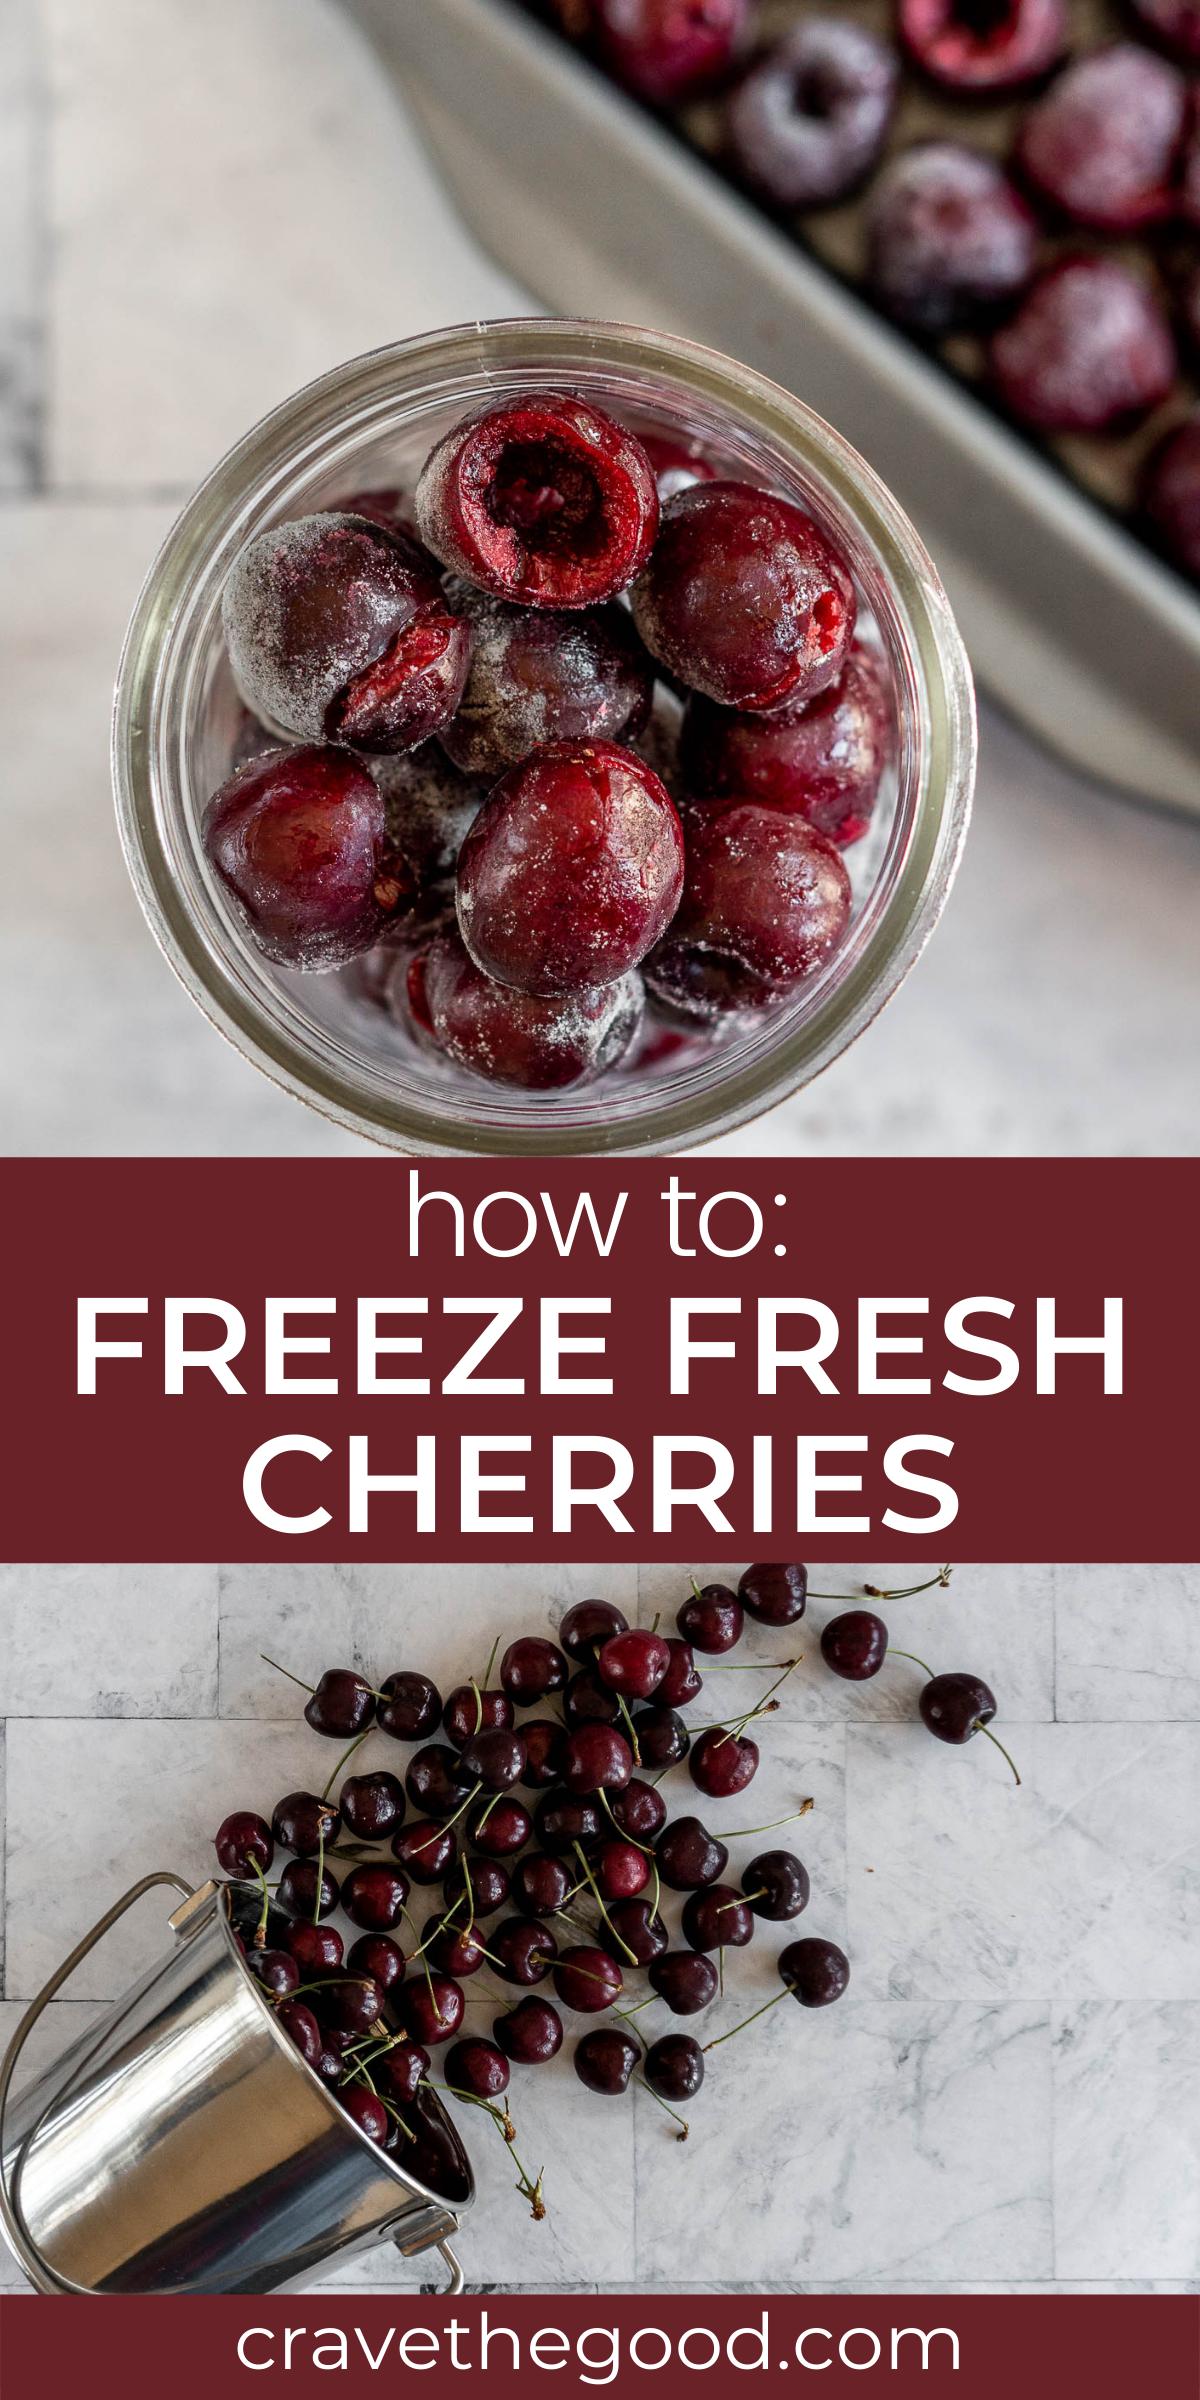 How to freeze fresh cherries pinterest graphic.